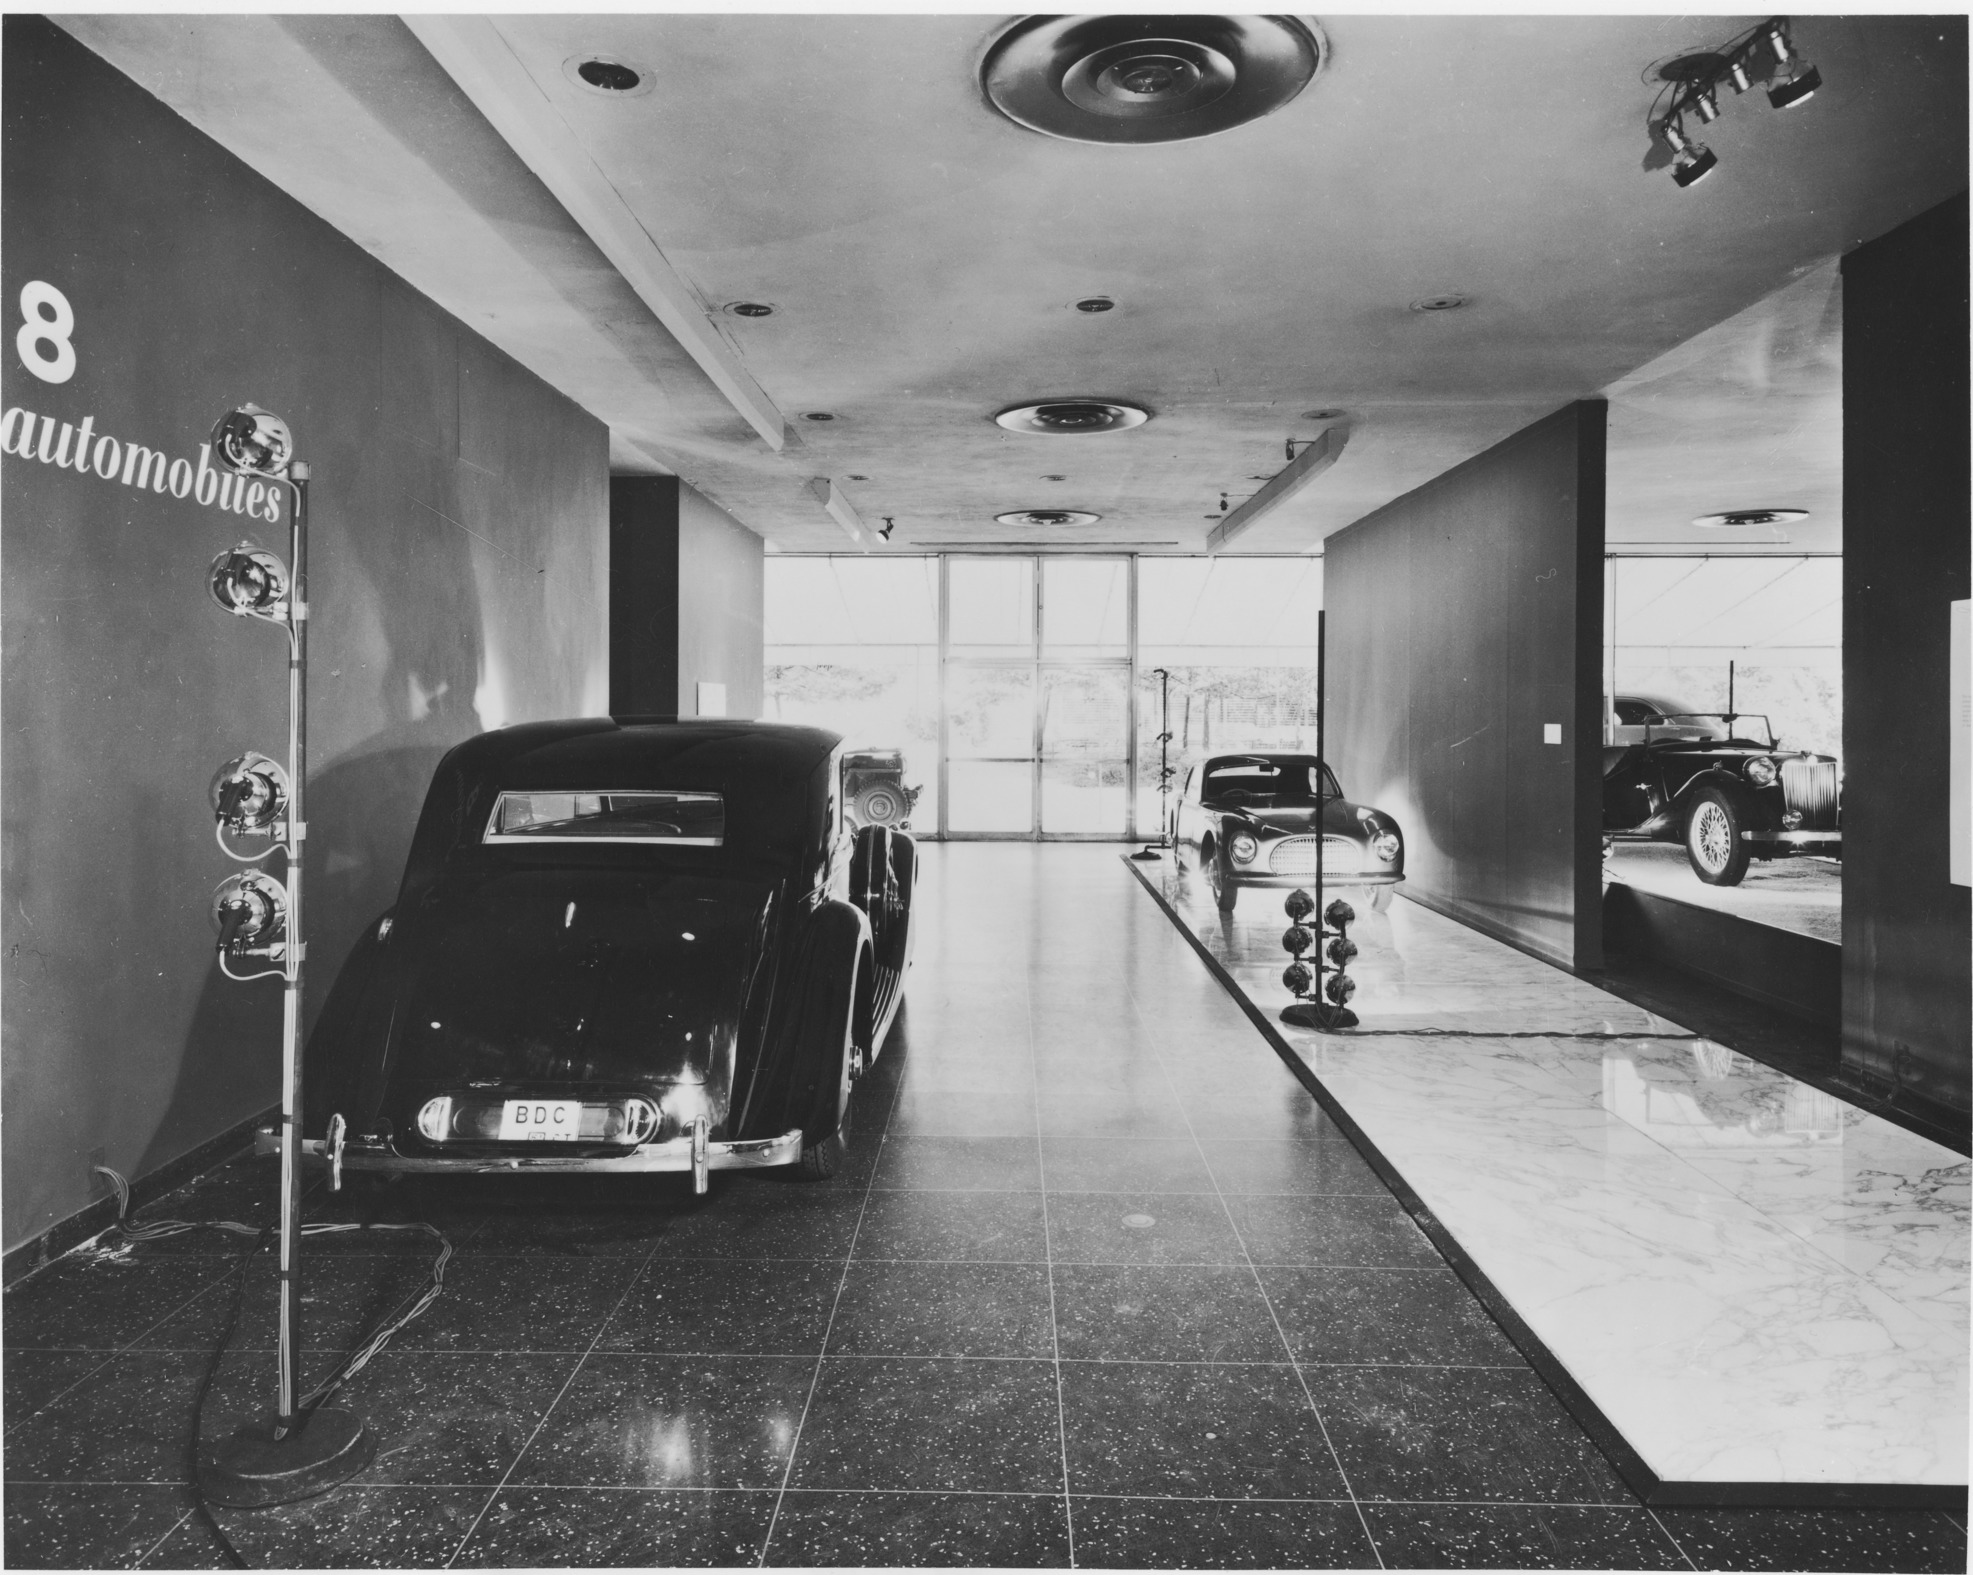 8 Automobiles | MoMA